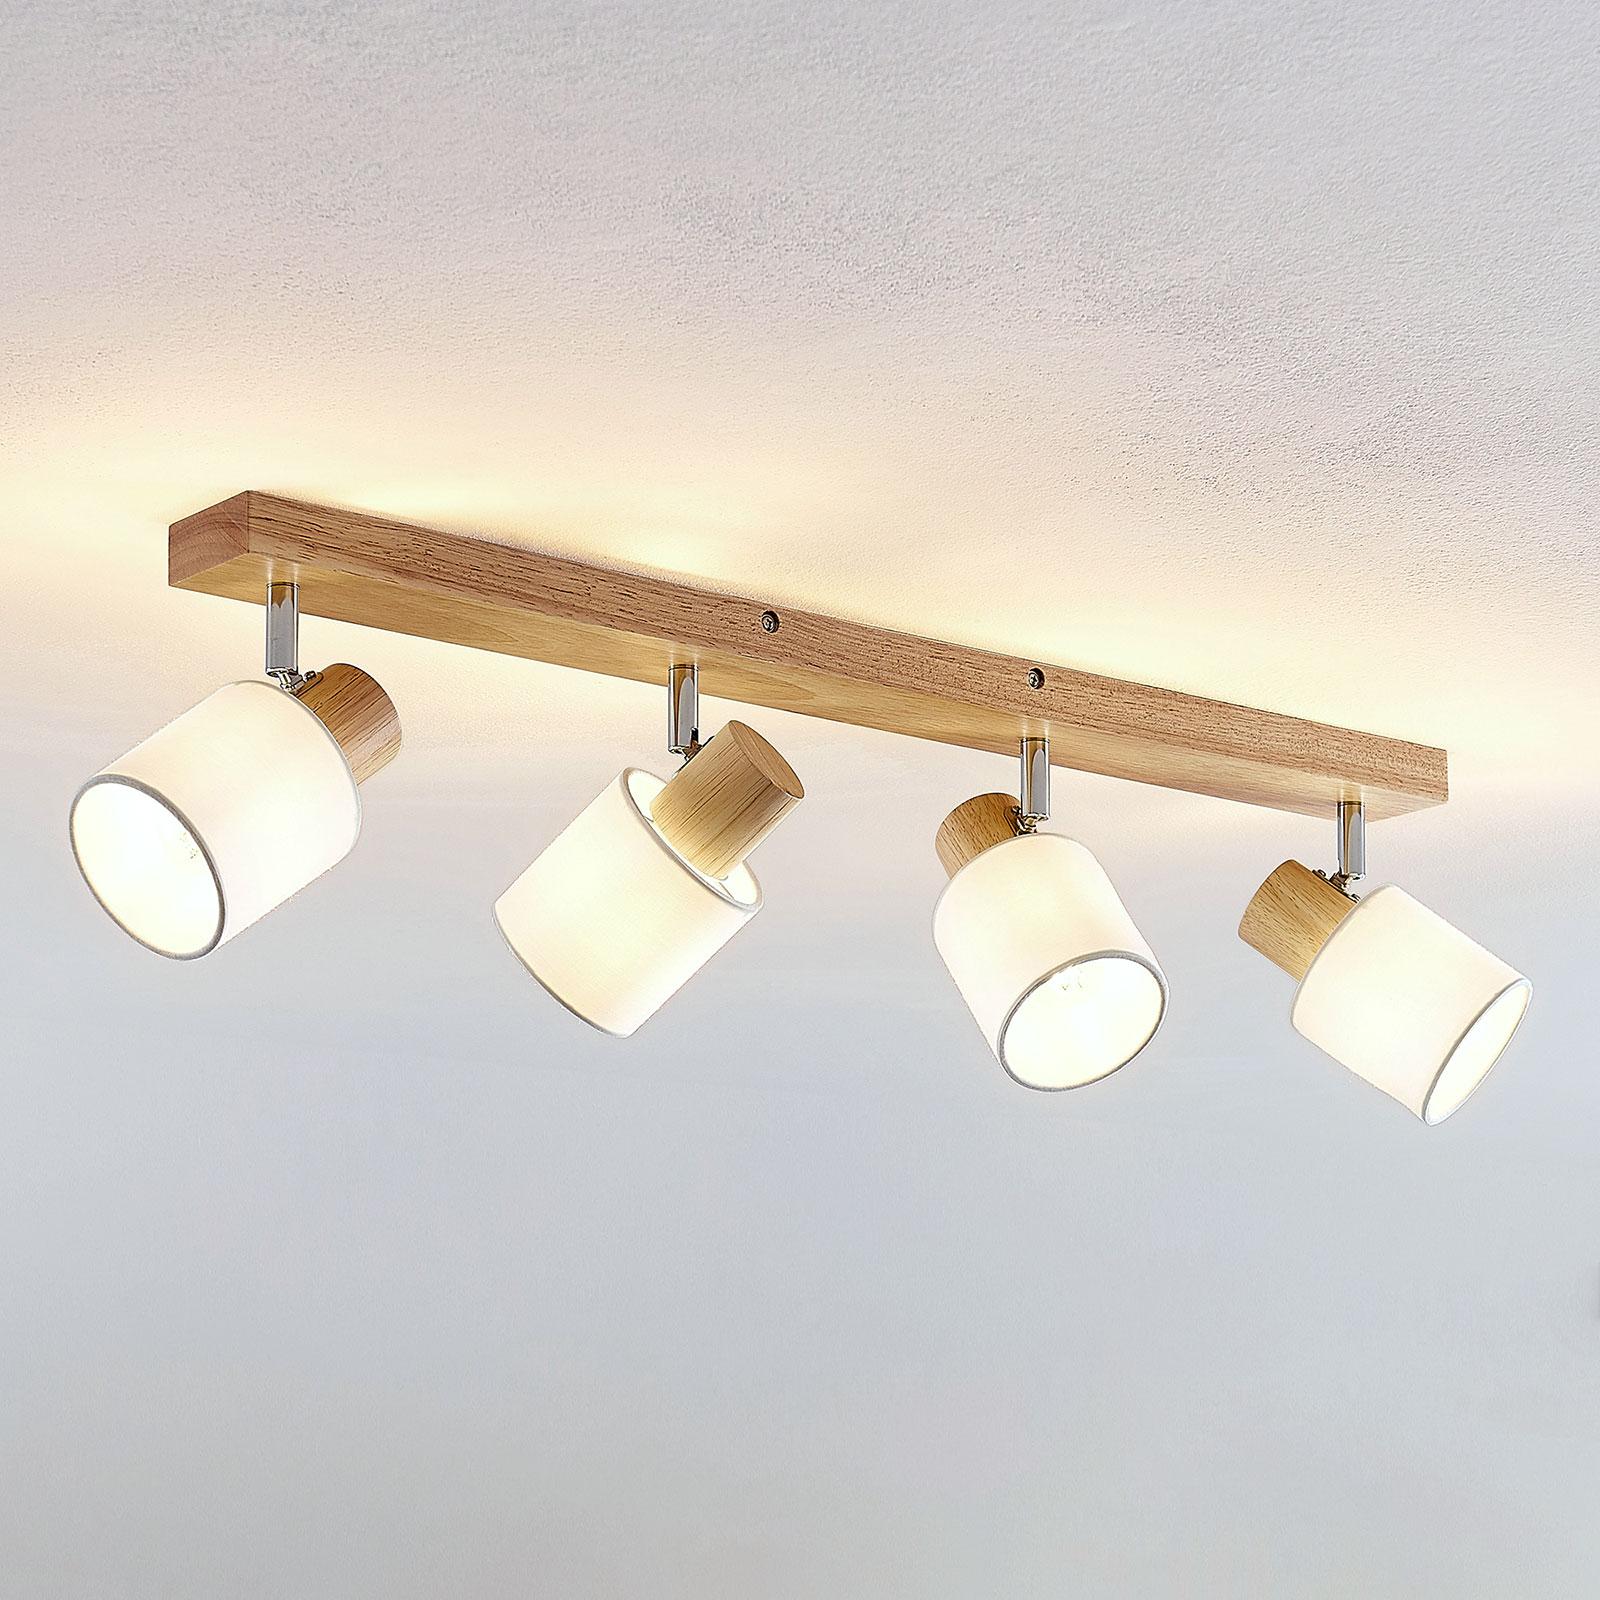 Lindby Wanessa takspotlight, 4 lampor